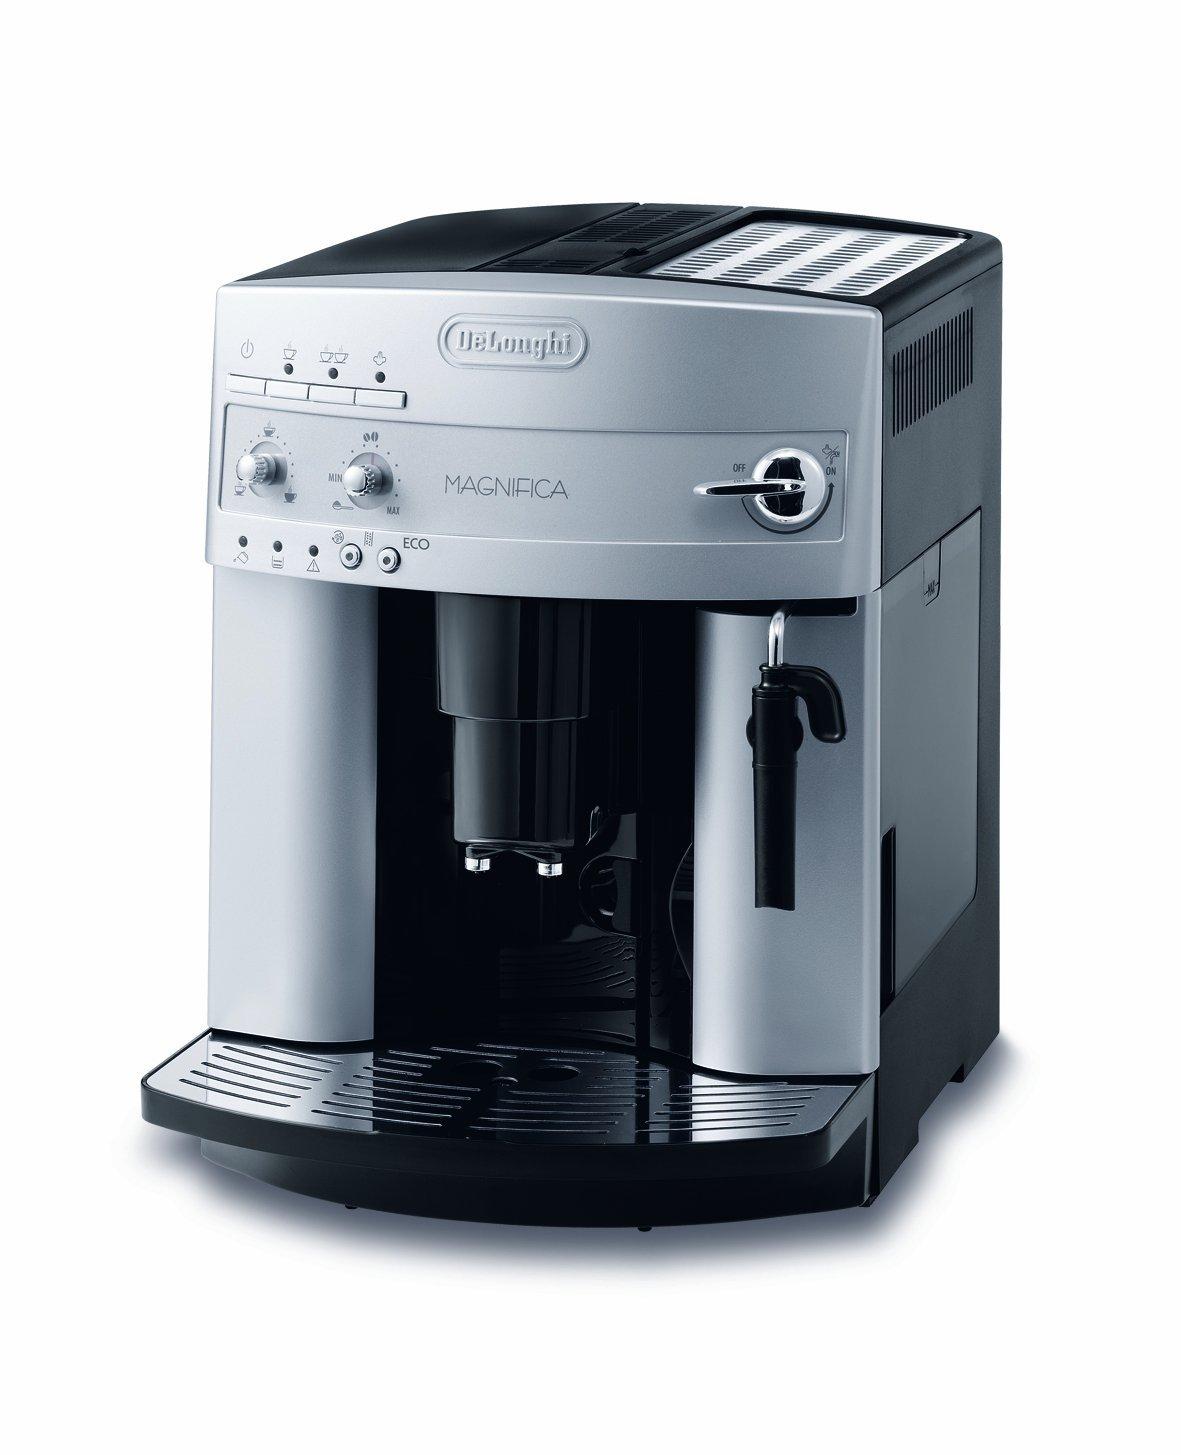 der esam 3200 s magnifica kaffee vollautomat von delonghi im test. Black Bedroom Furniture Sets. Home Design Ideas